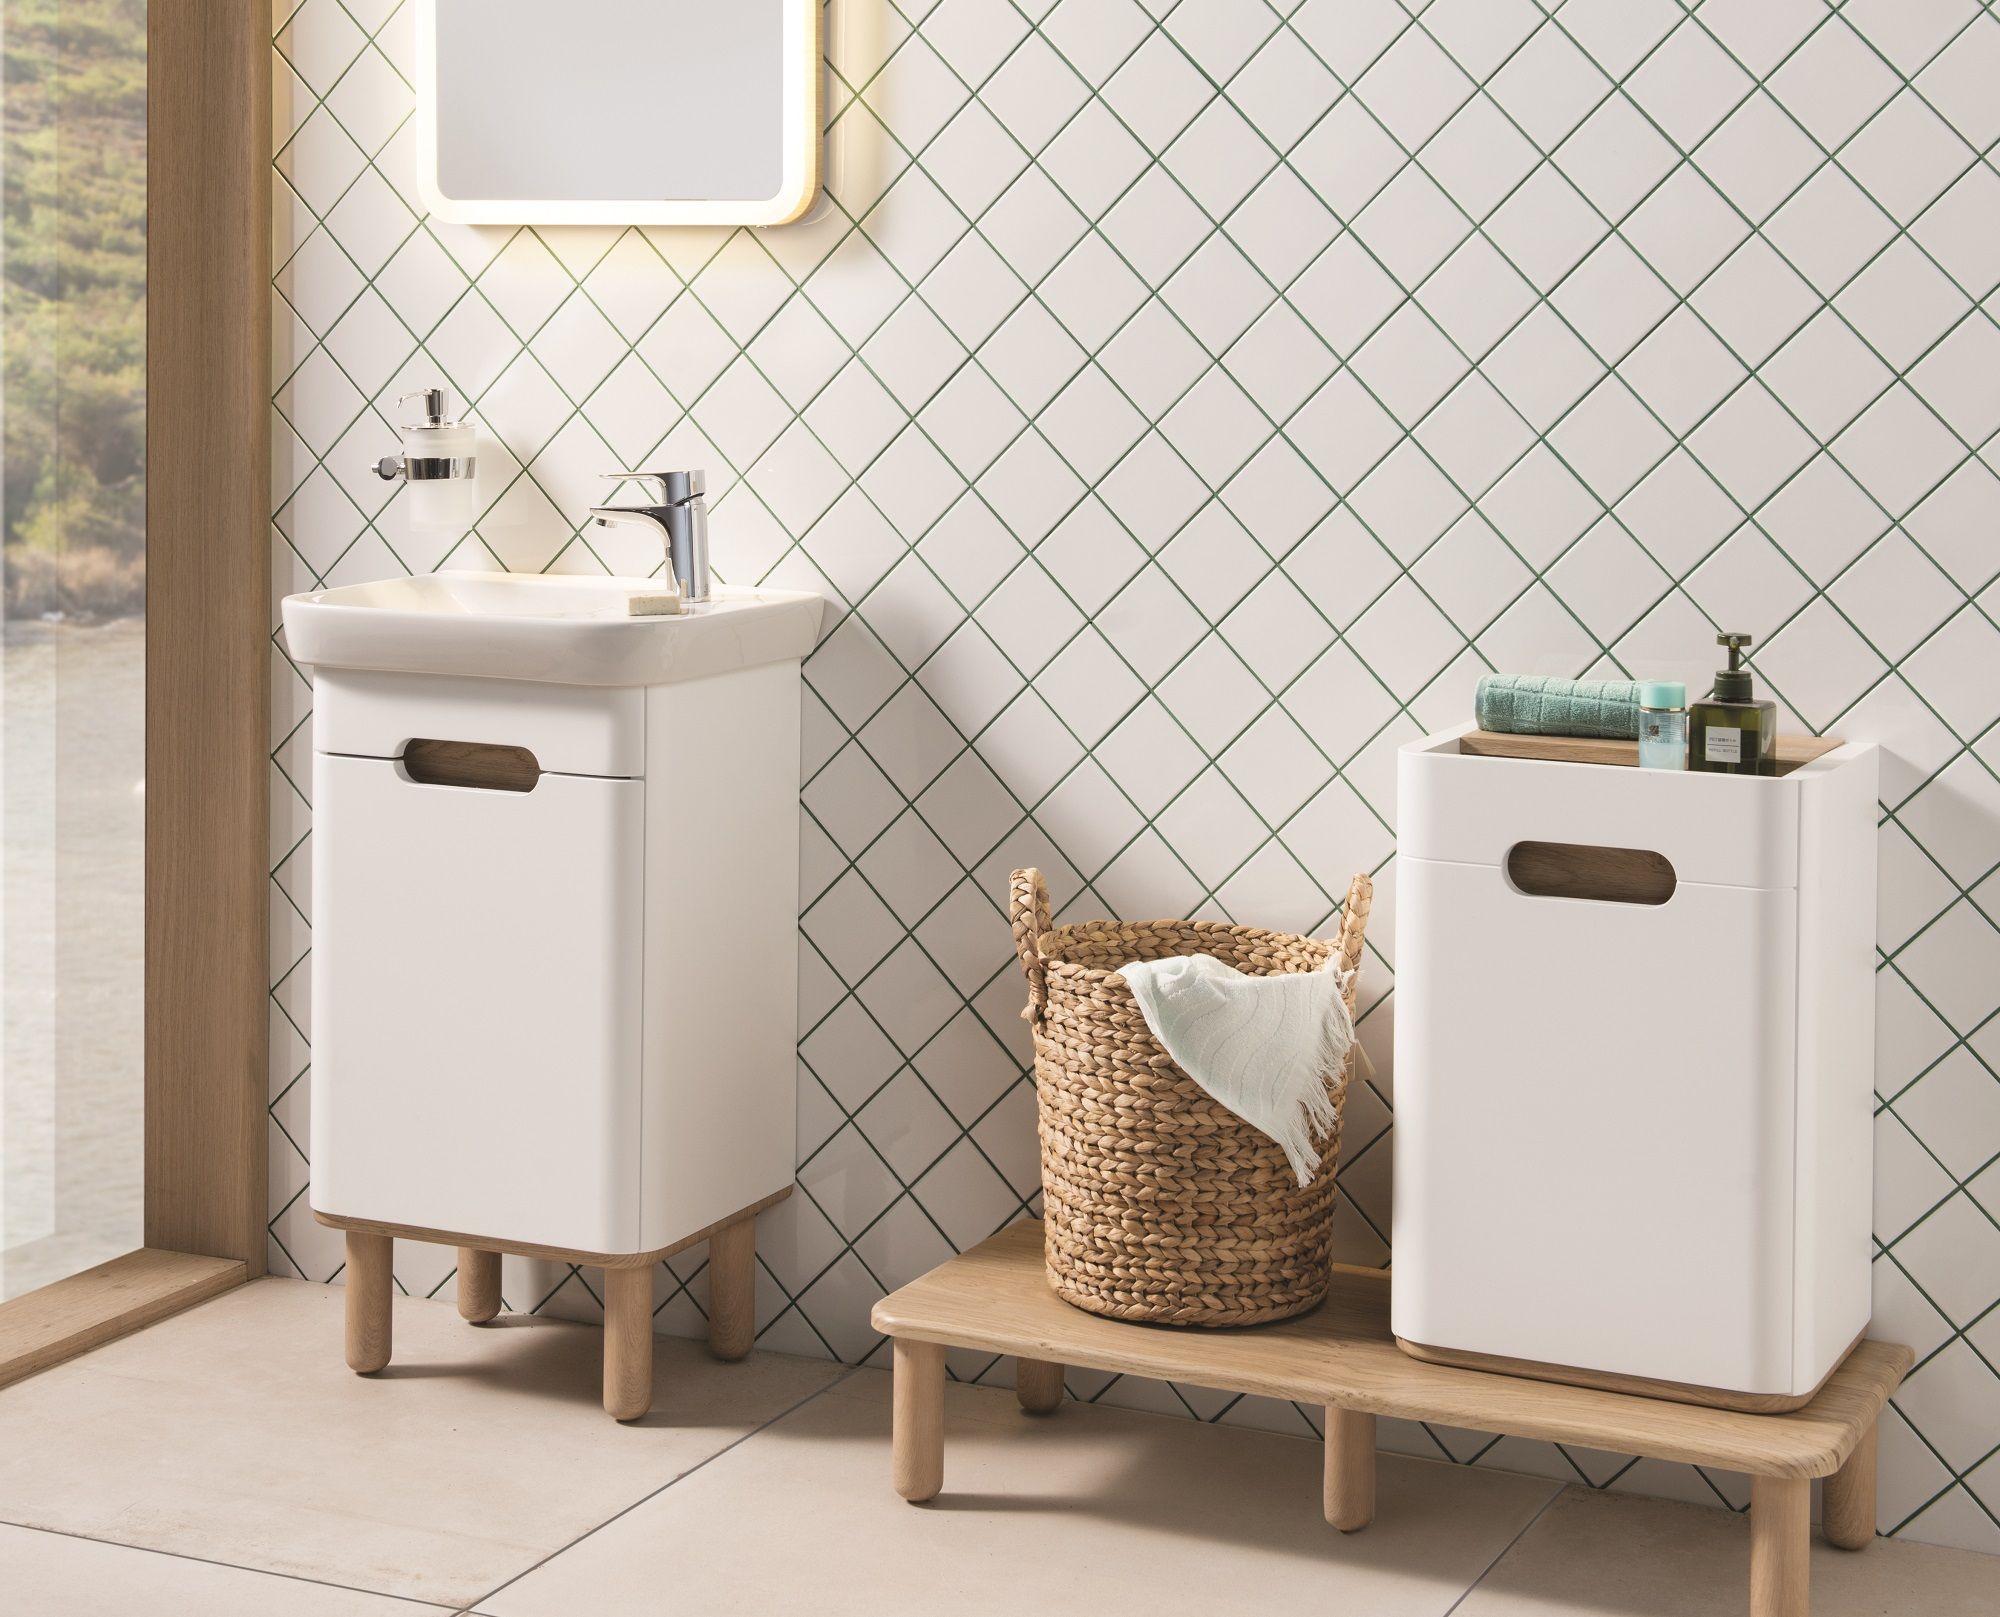 Our Own Little Pebble Beach Shower Remodel Stone Shower Floor Small Shower Remodel